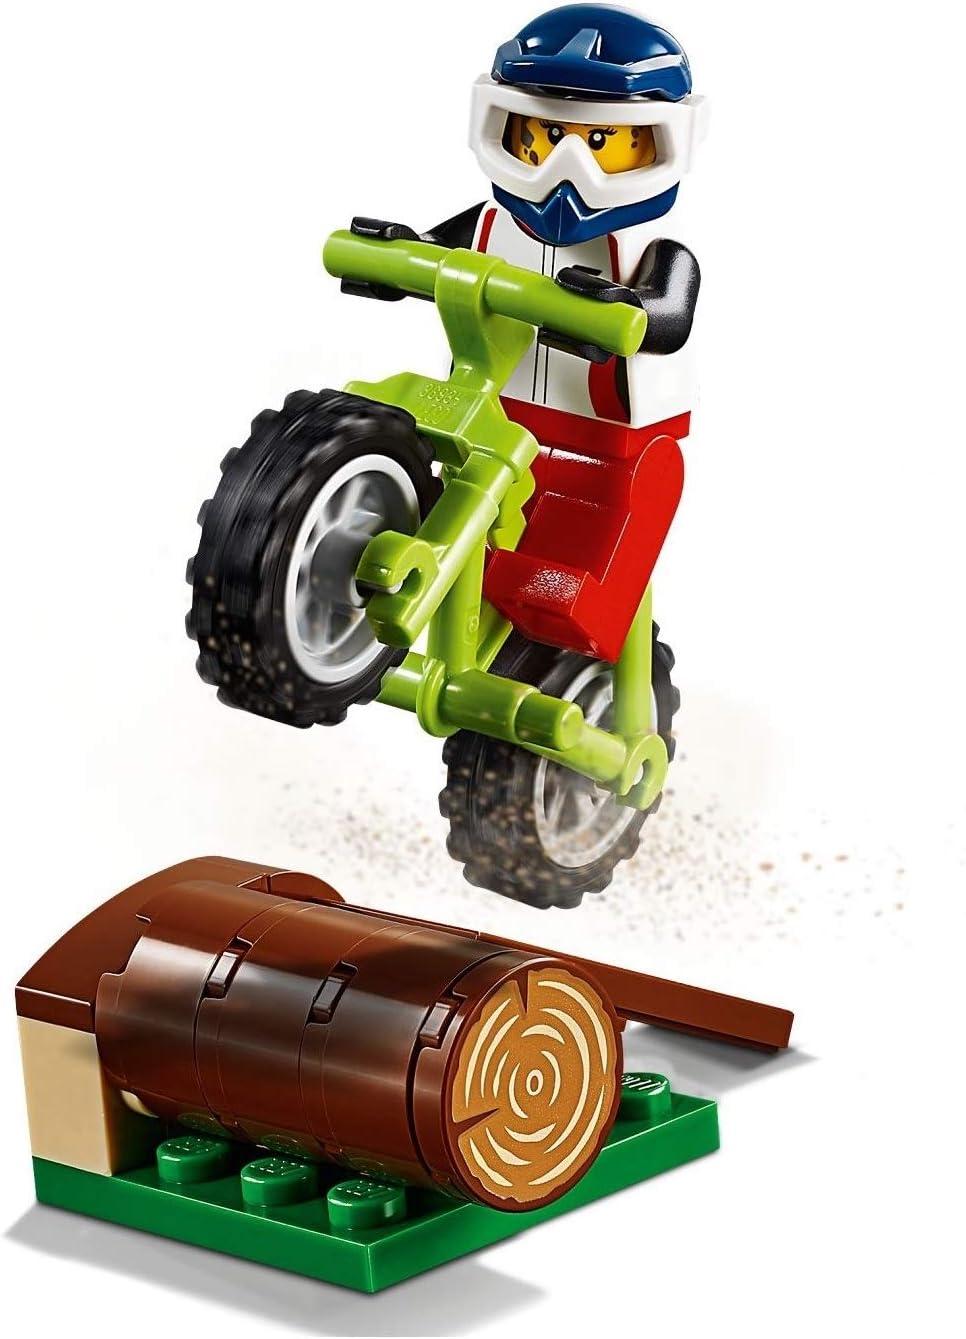 LEGO 60202 Minifigura de Aventura al Aire Libre: Bicicleta de ...